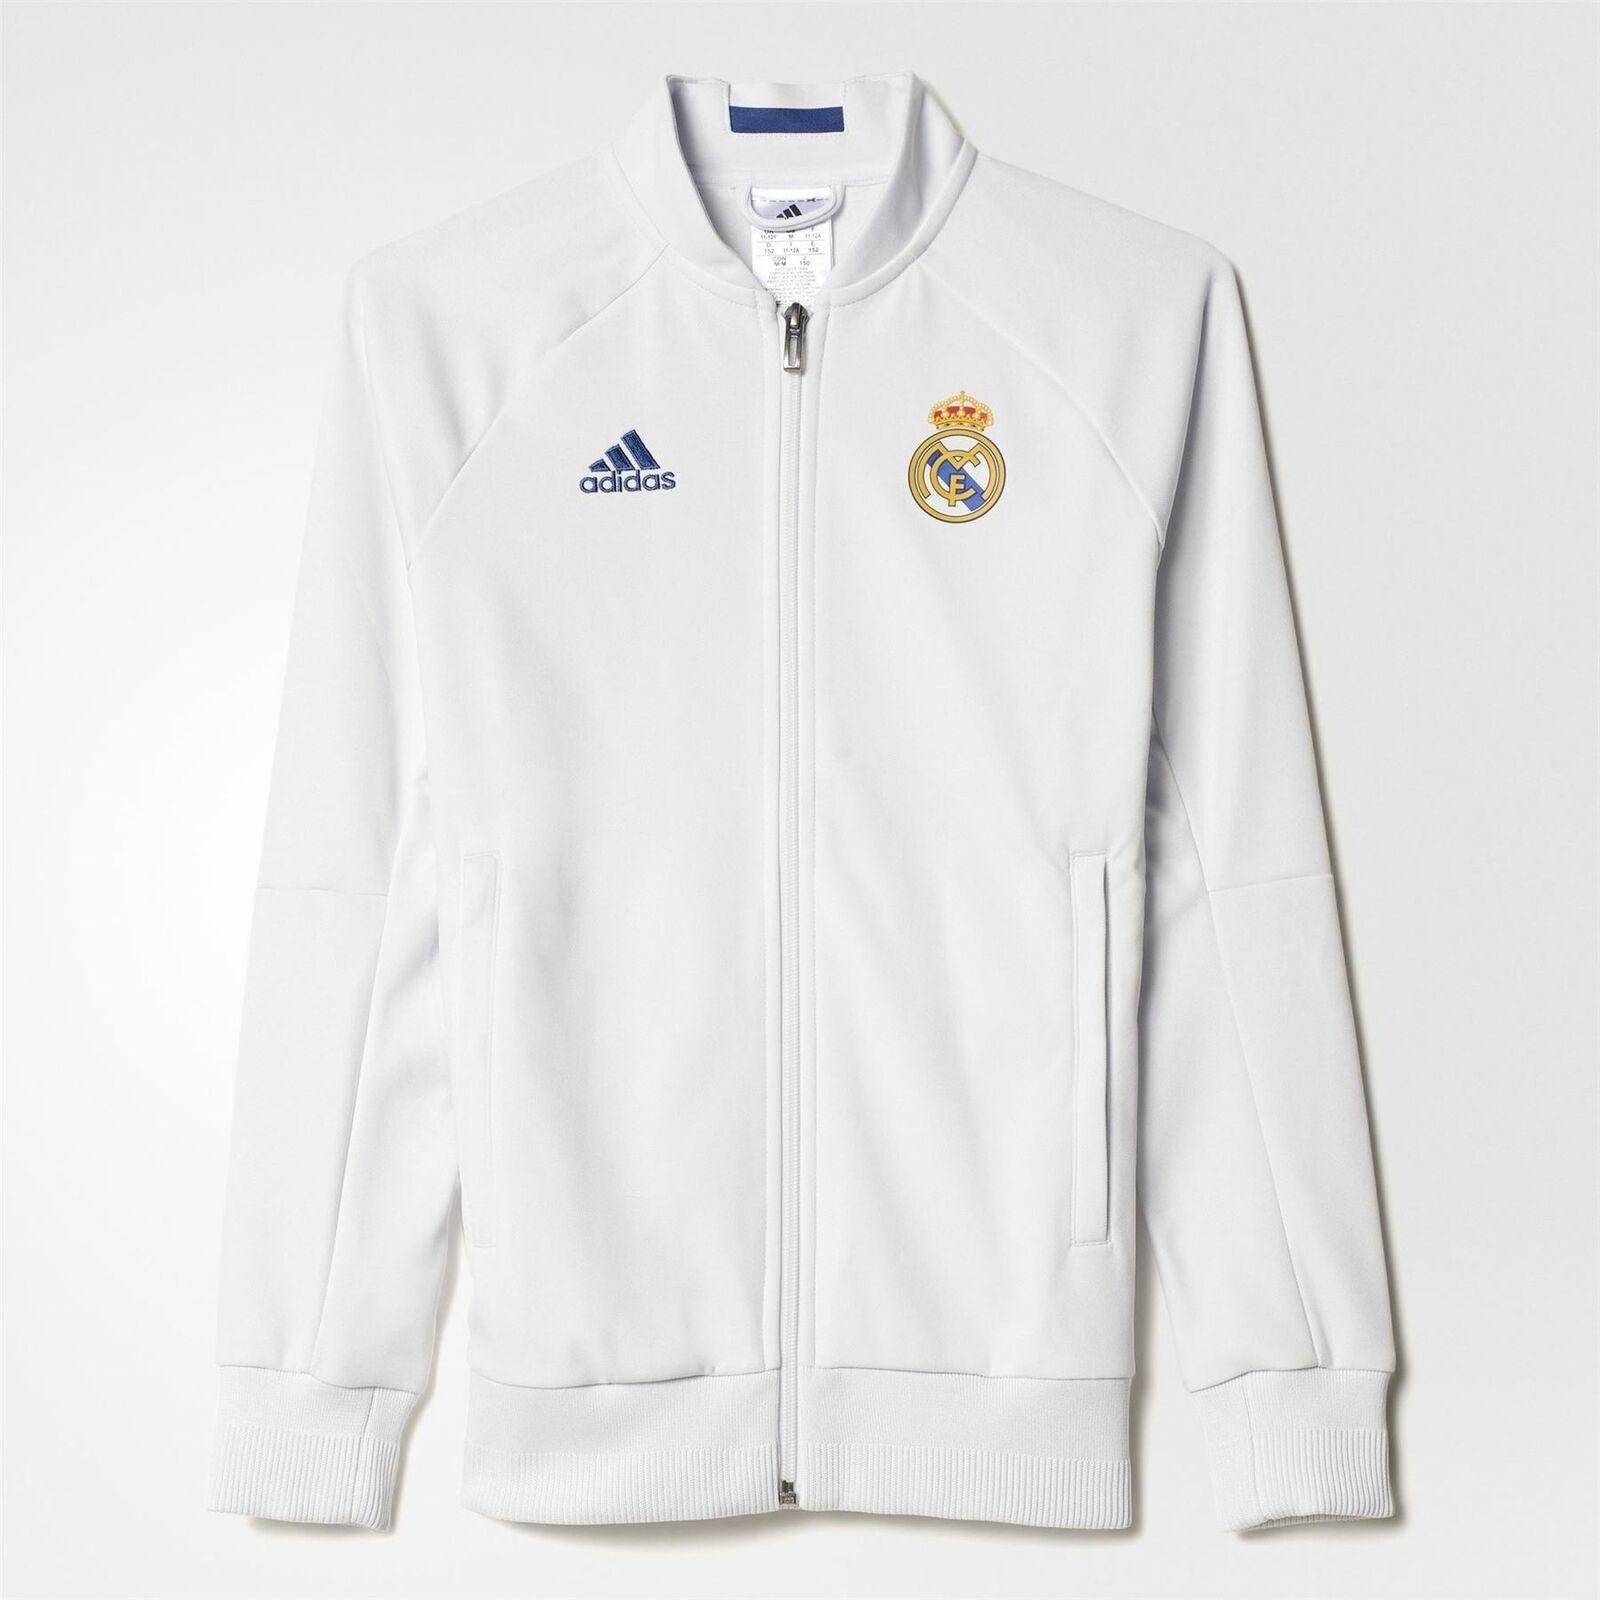 Adidas Real Madrid Inno Giacca Juniors Bianco Calcio Giacca Tuta